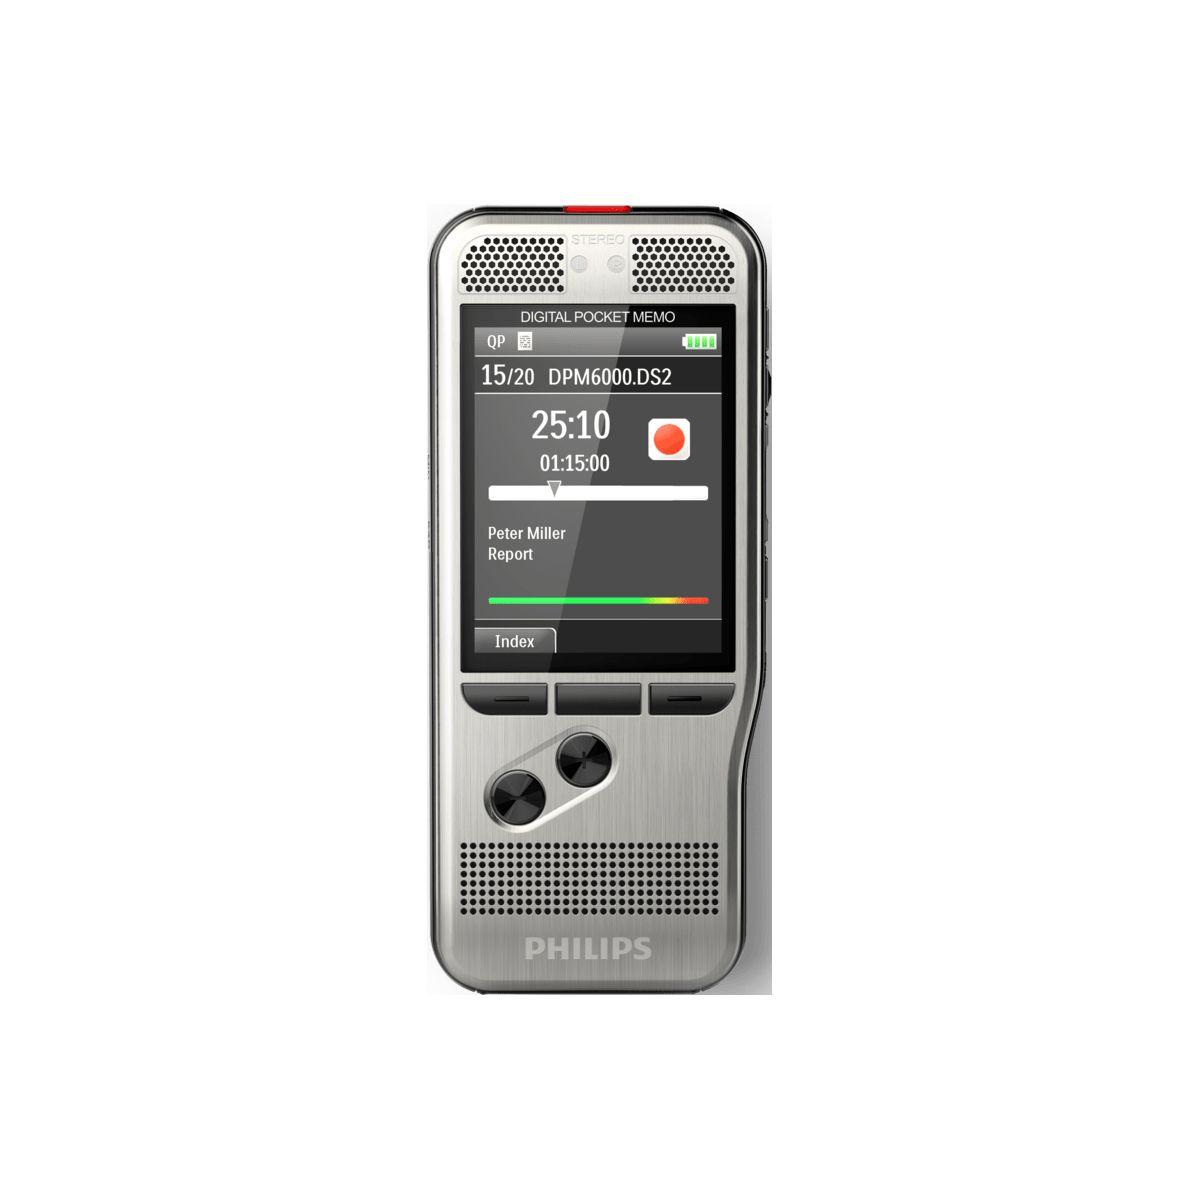 Dictaphone PHILIPS Pocket-Mémo DPM6000 (photo)